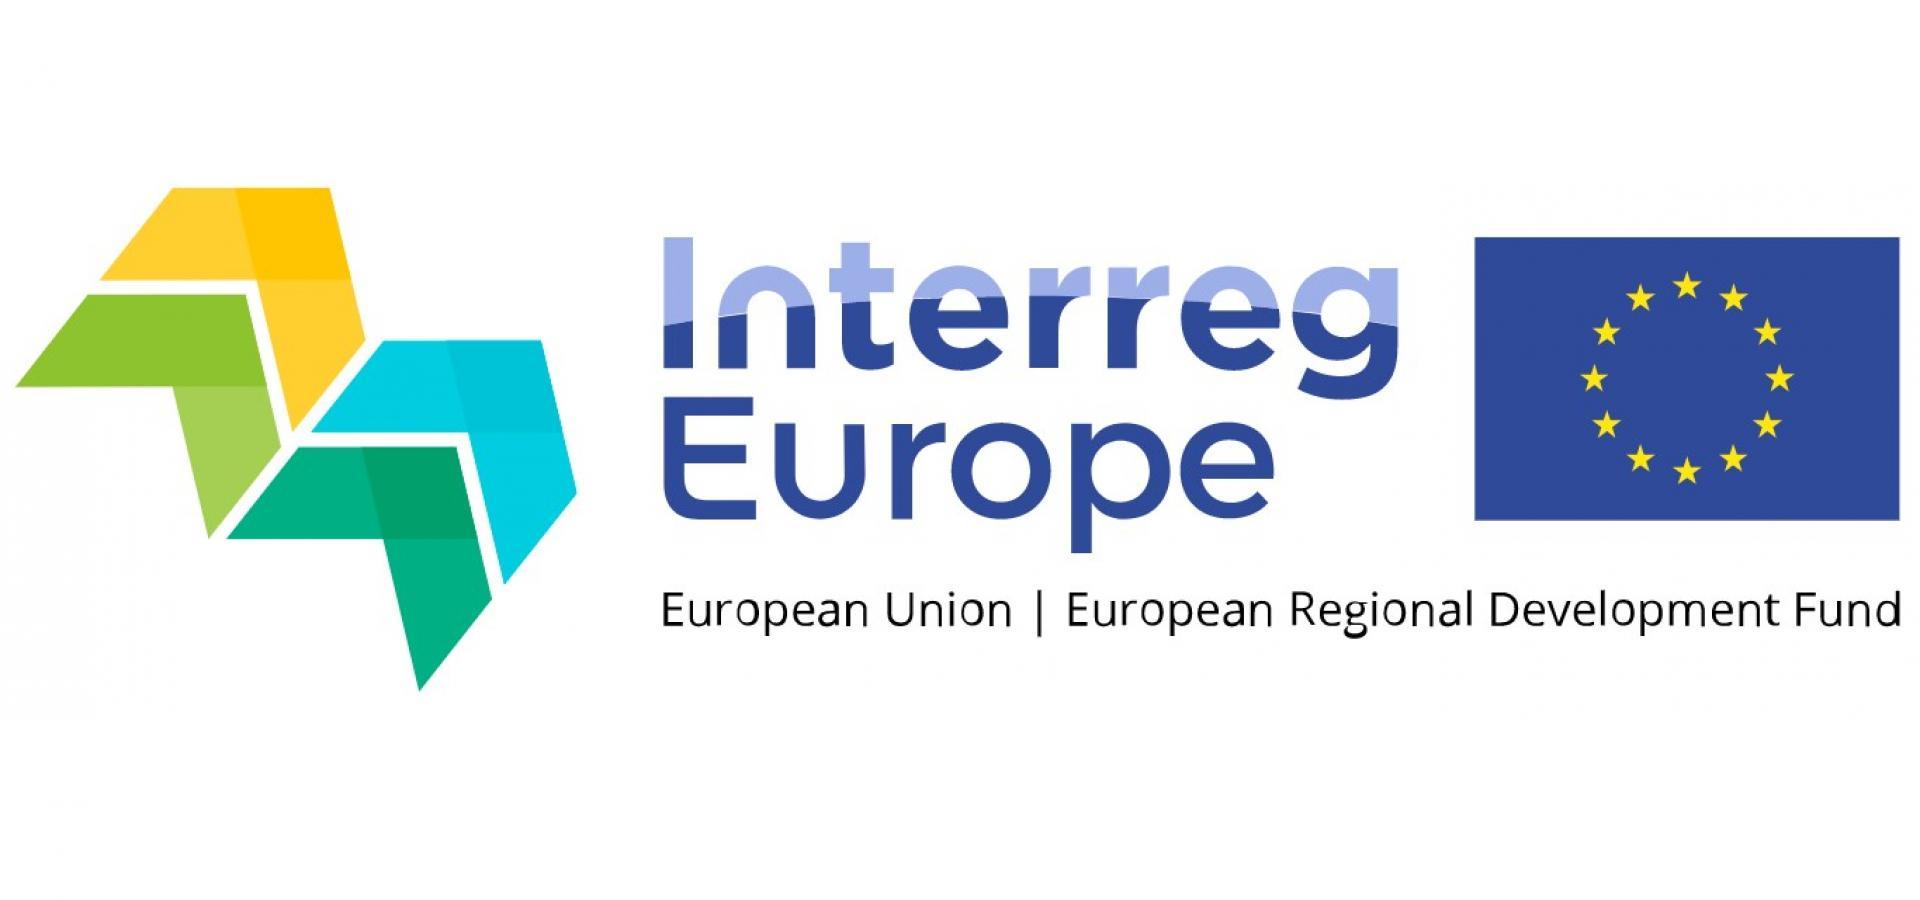 Webinarium Interreg Europa: Tackling the urban freight logistics challenge, 23 marca br. - zobacz więcej